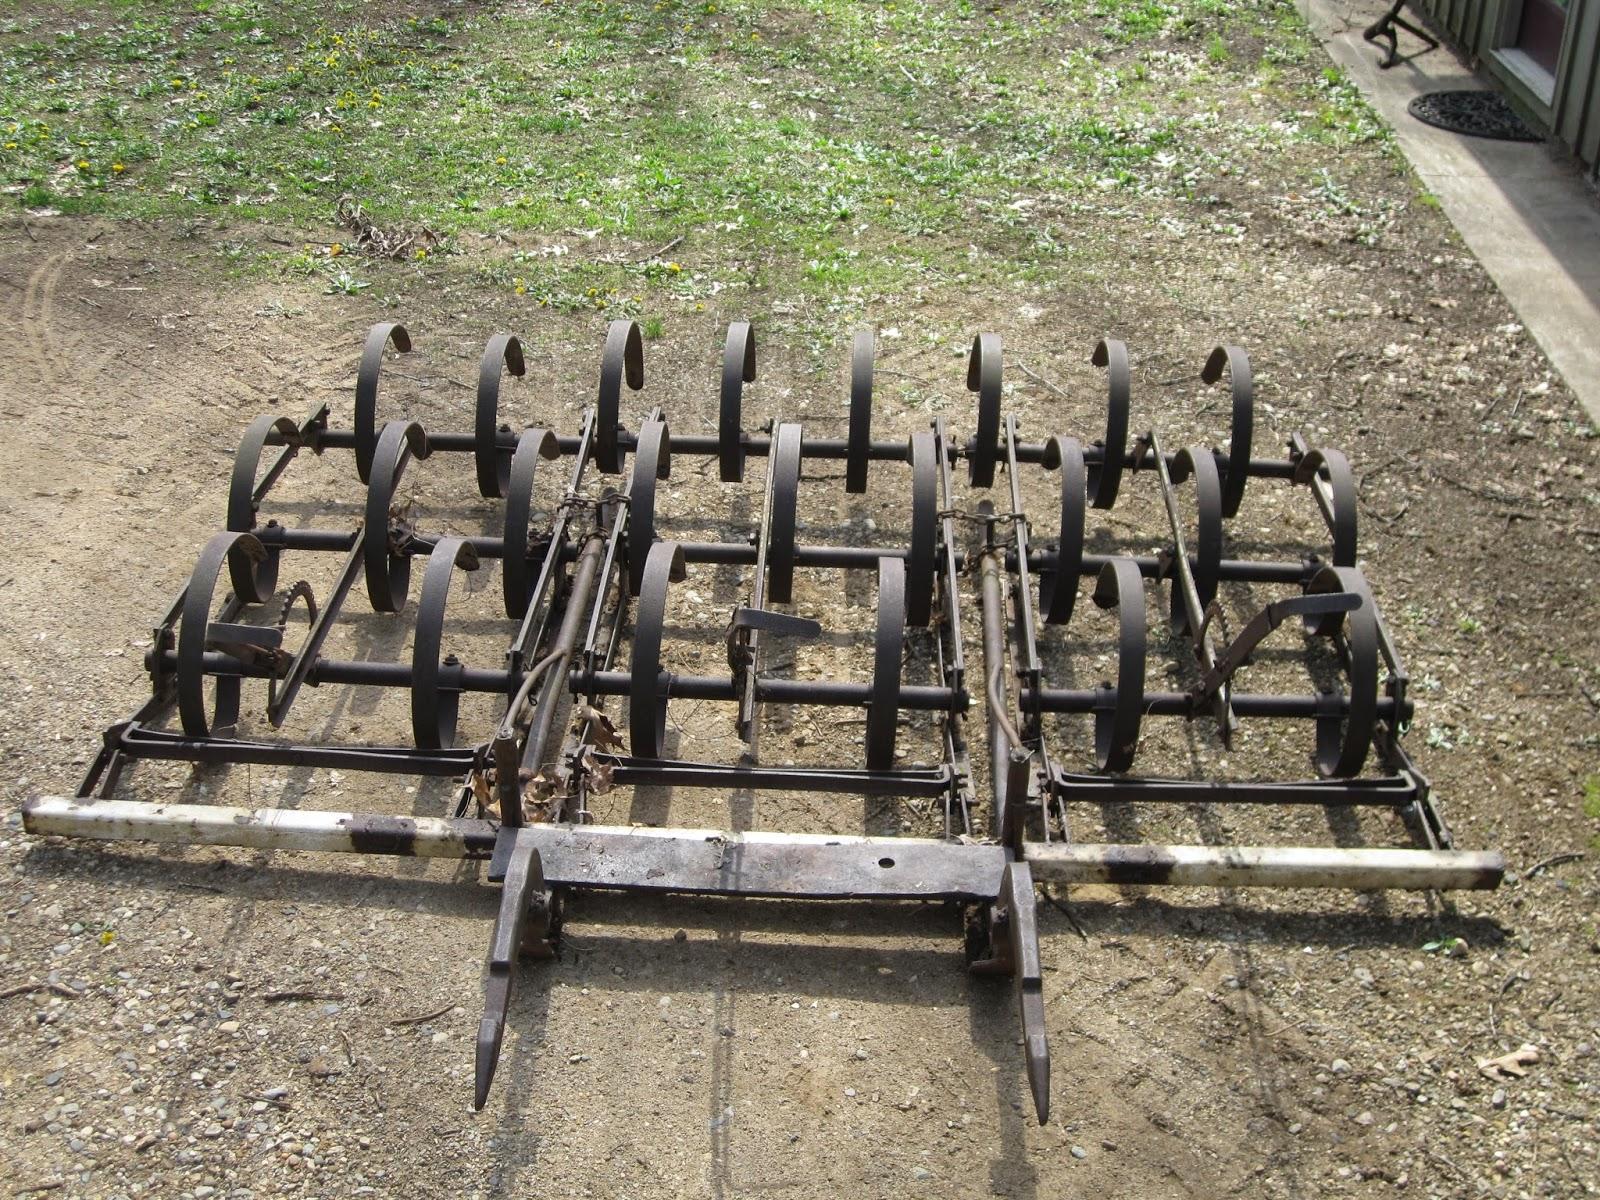 Farmall Hitch Leveling Bar : Springtooth harrow like the c farmall super and